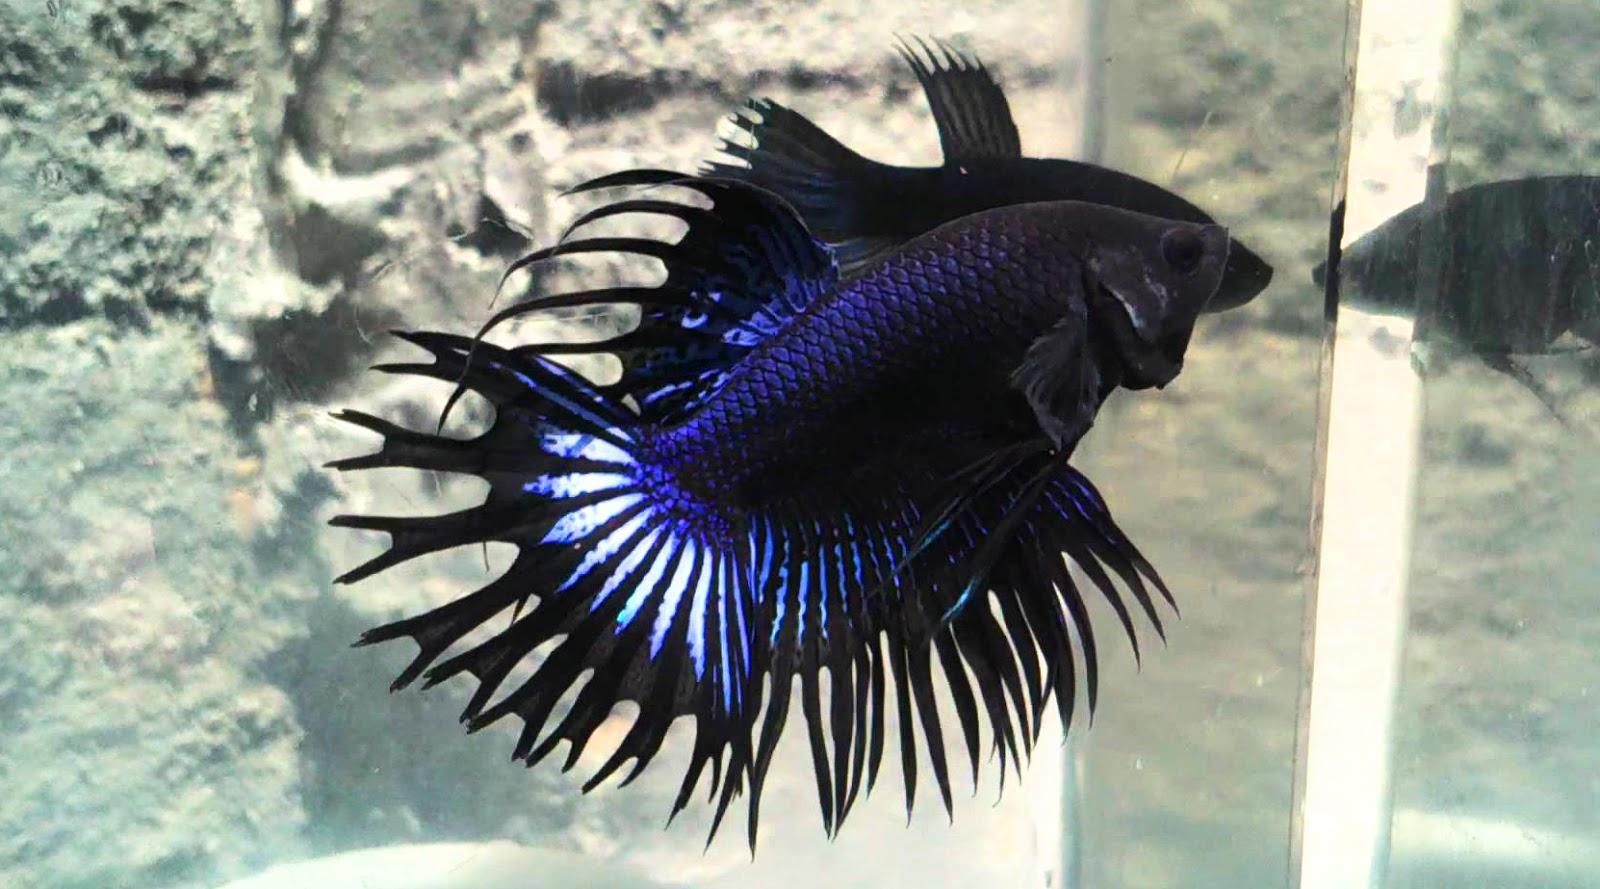 7 makanan ikan cupang 7 jenis ikan cupang 7 jenis makanan ikan cupang dunia binatang trans7 ikan cupang